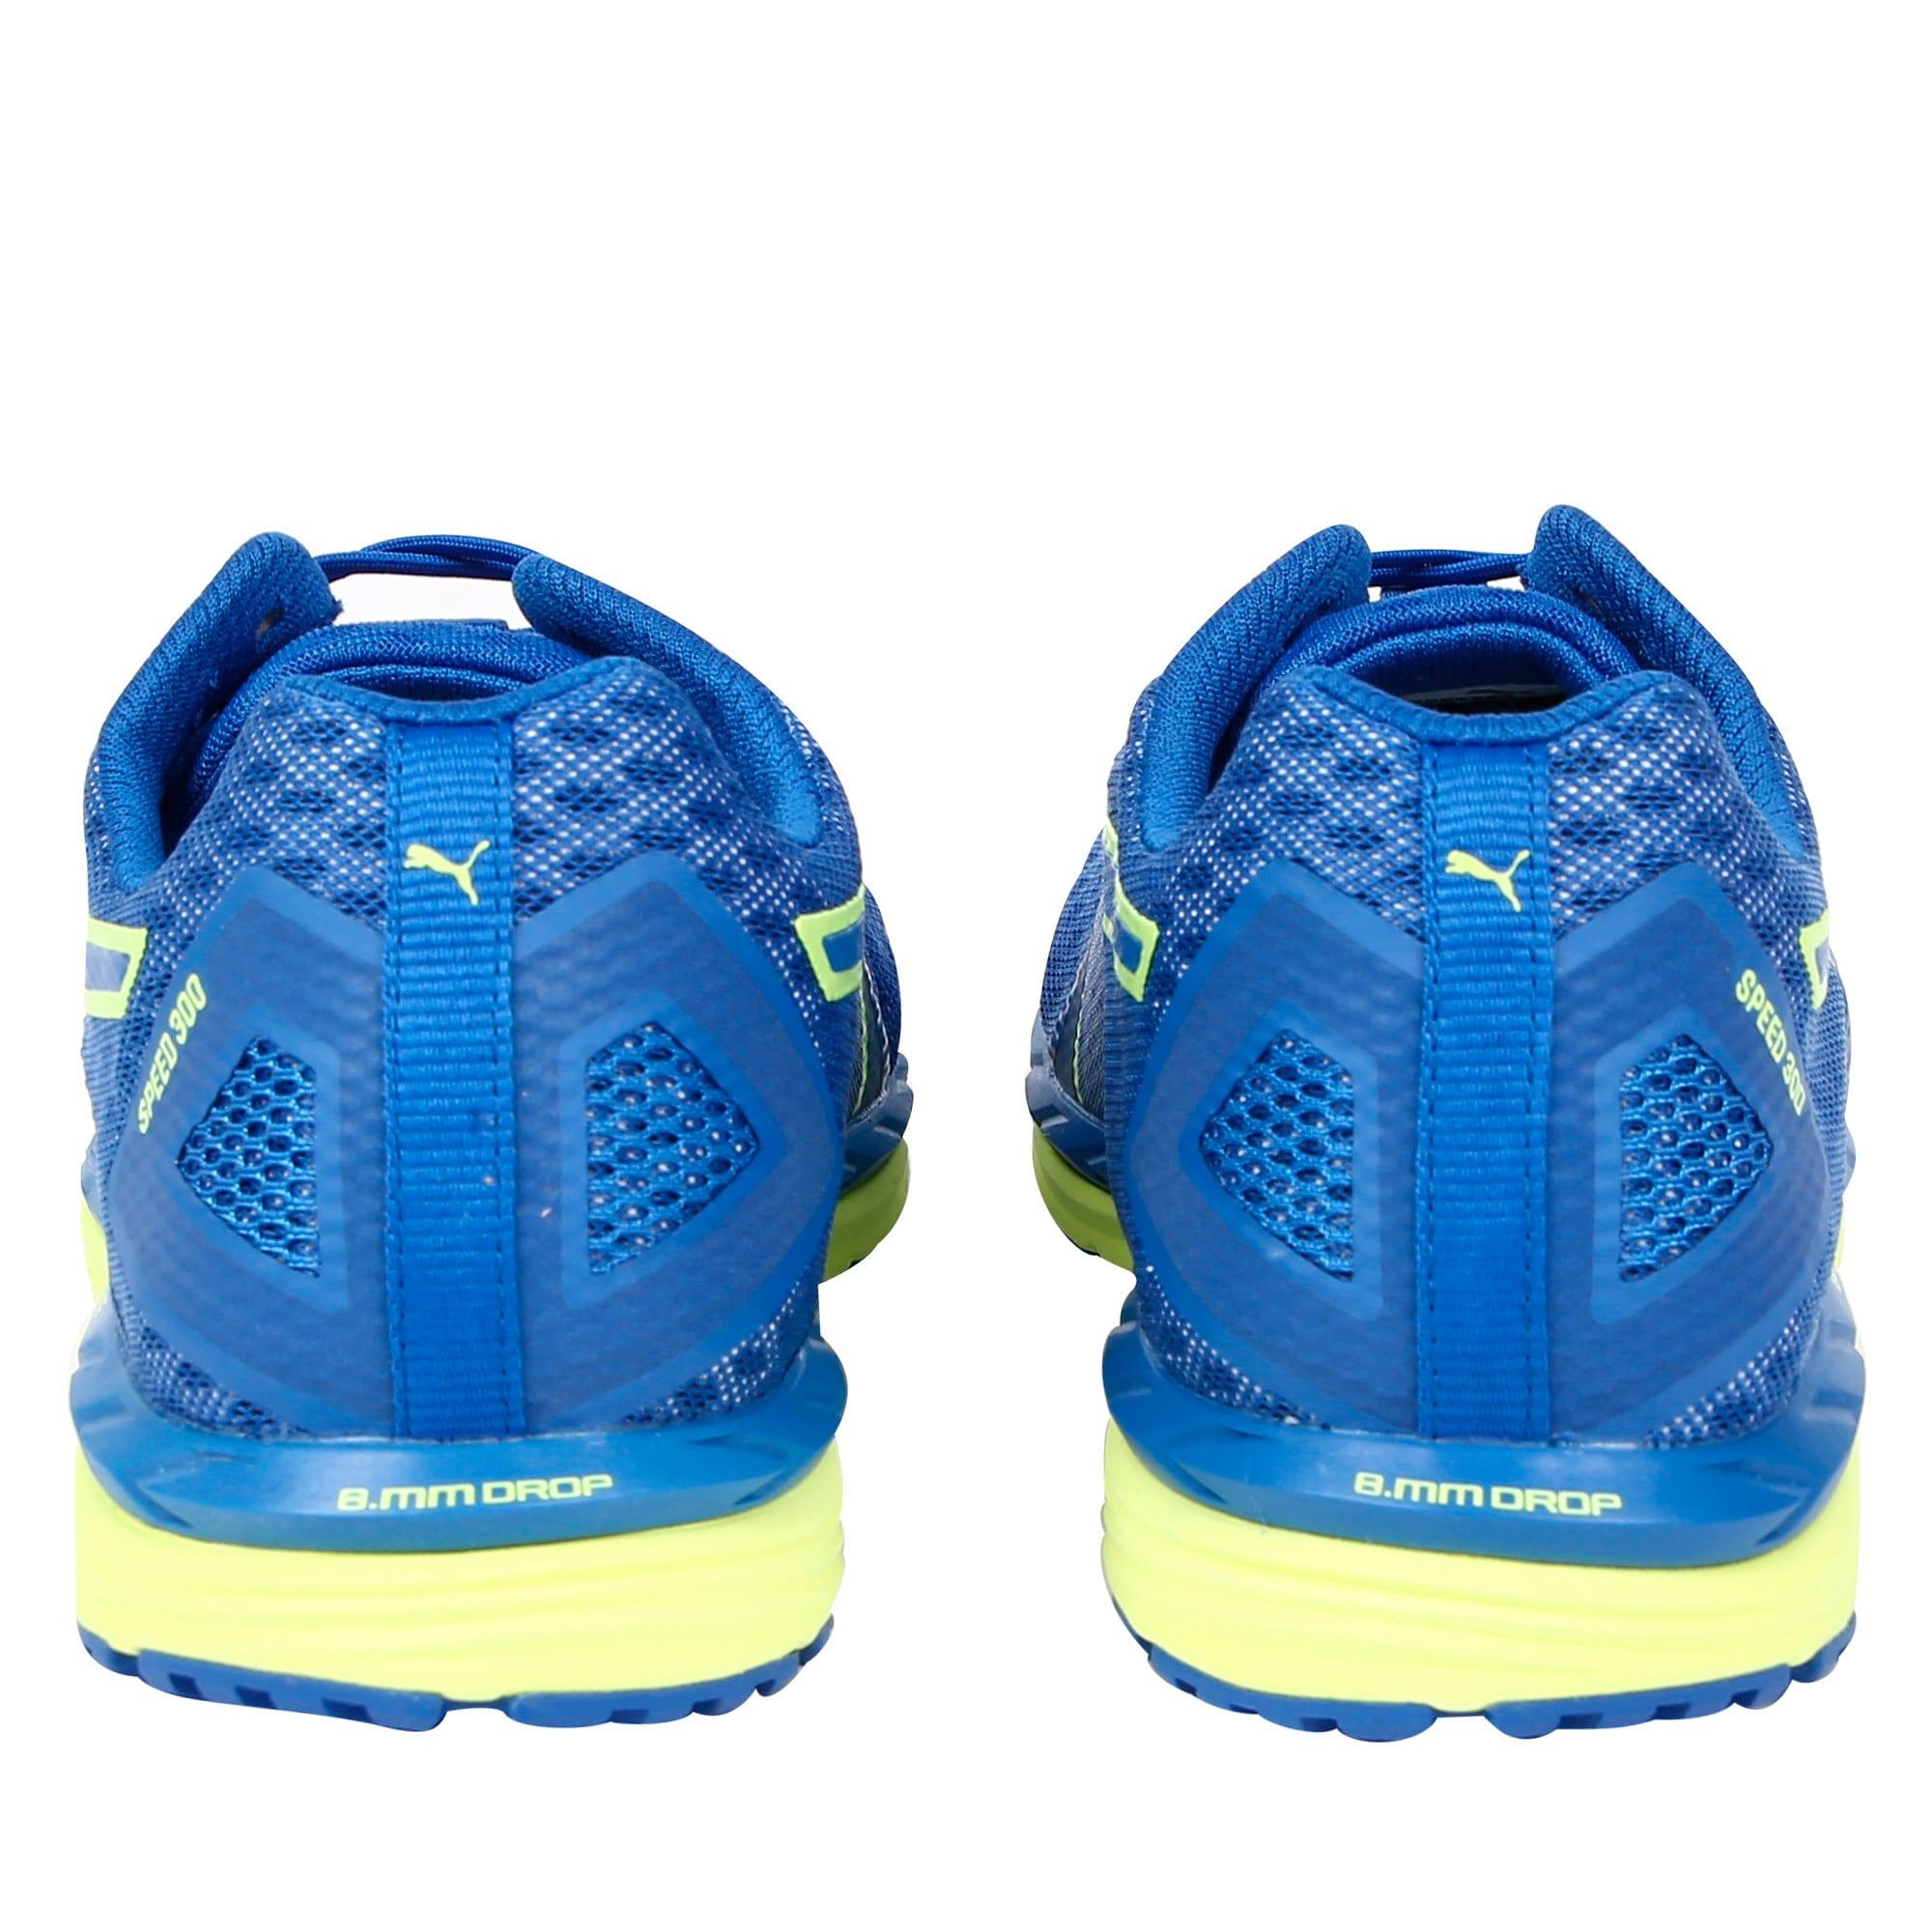 Thumbnail 3 of Speed 300 IGNITE 3 Men's Running Shoes, Turkish Sea-Peacoat-Yellow, medium-IND